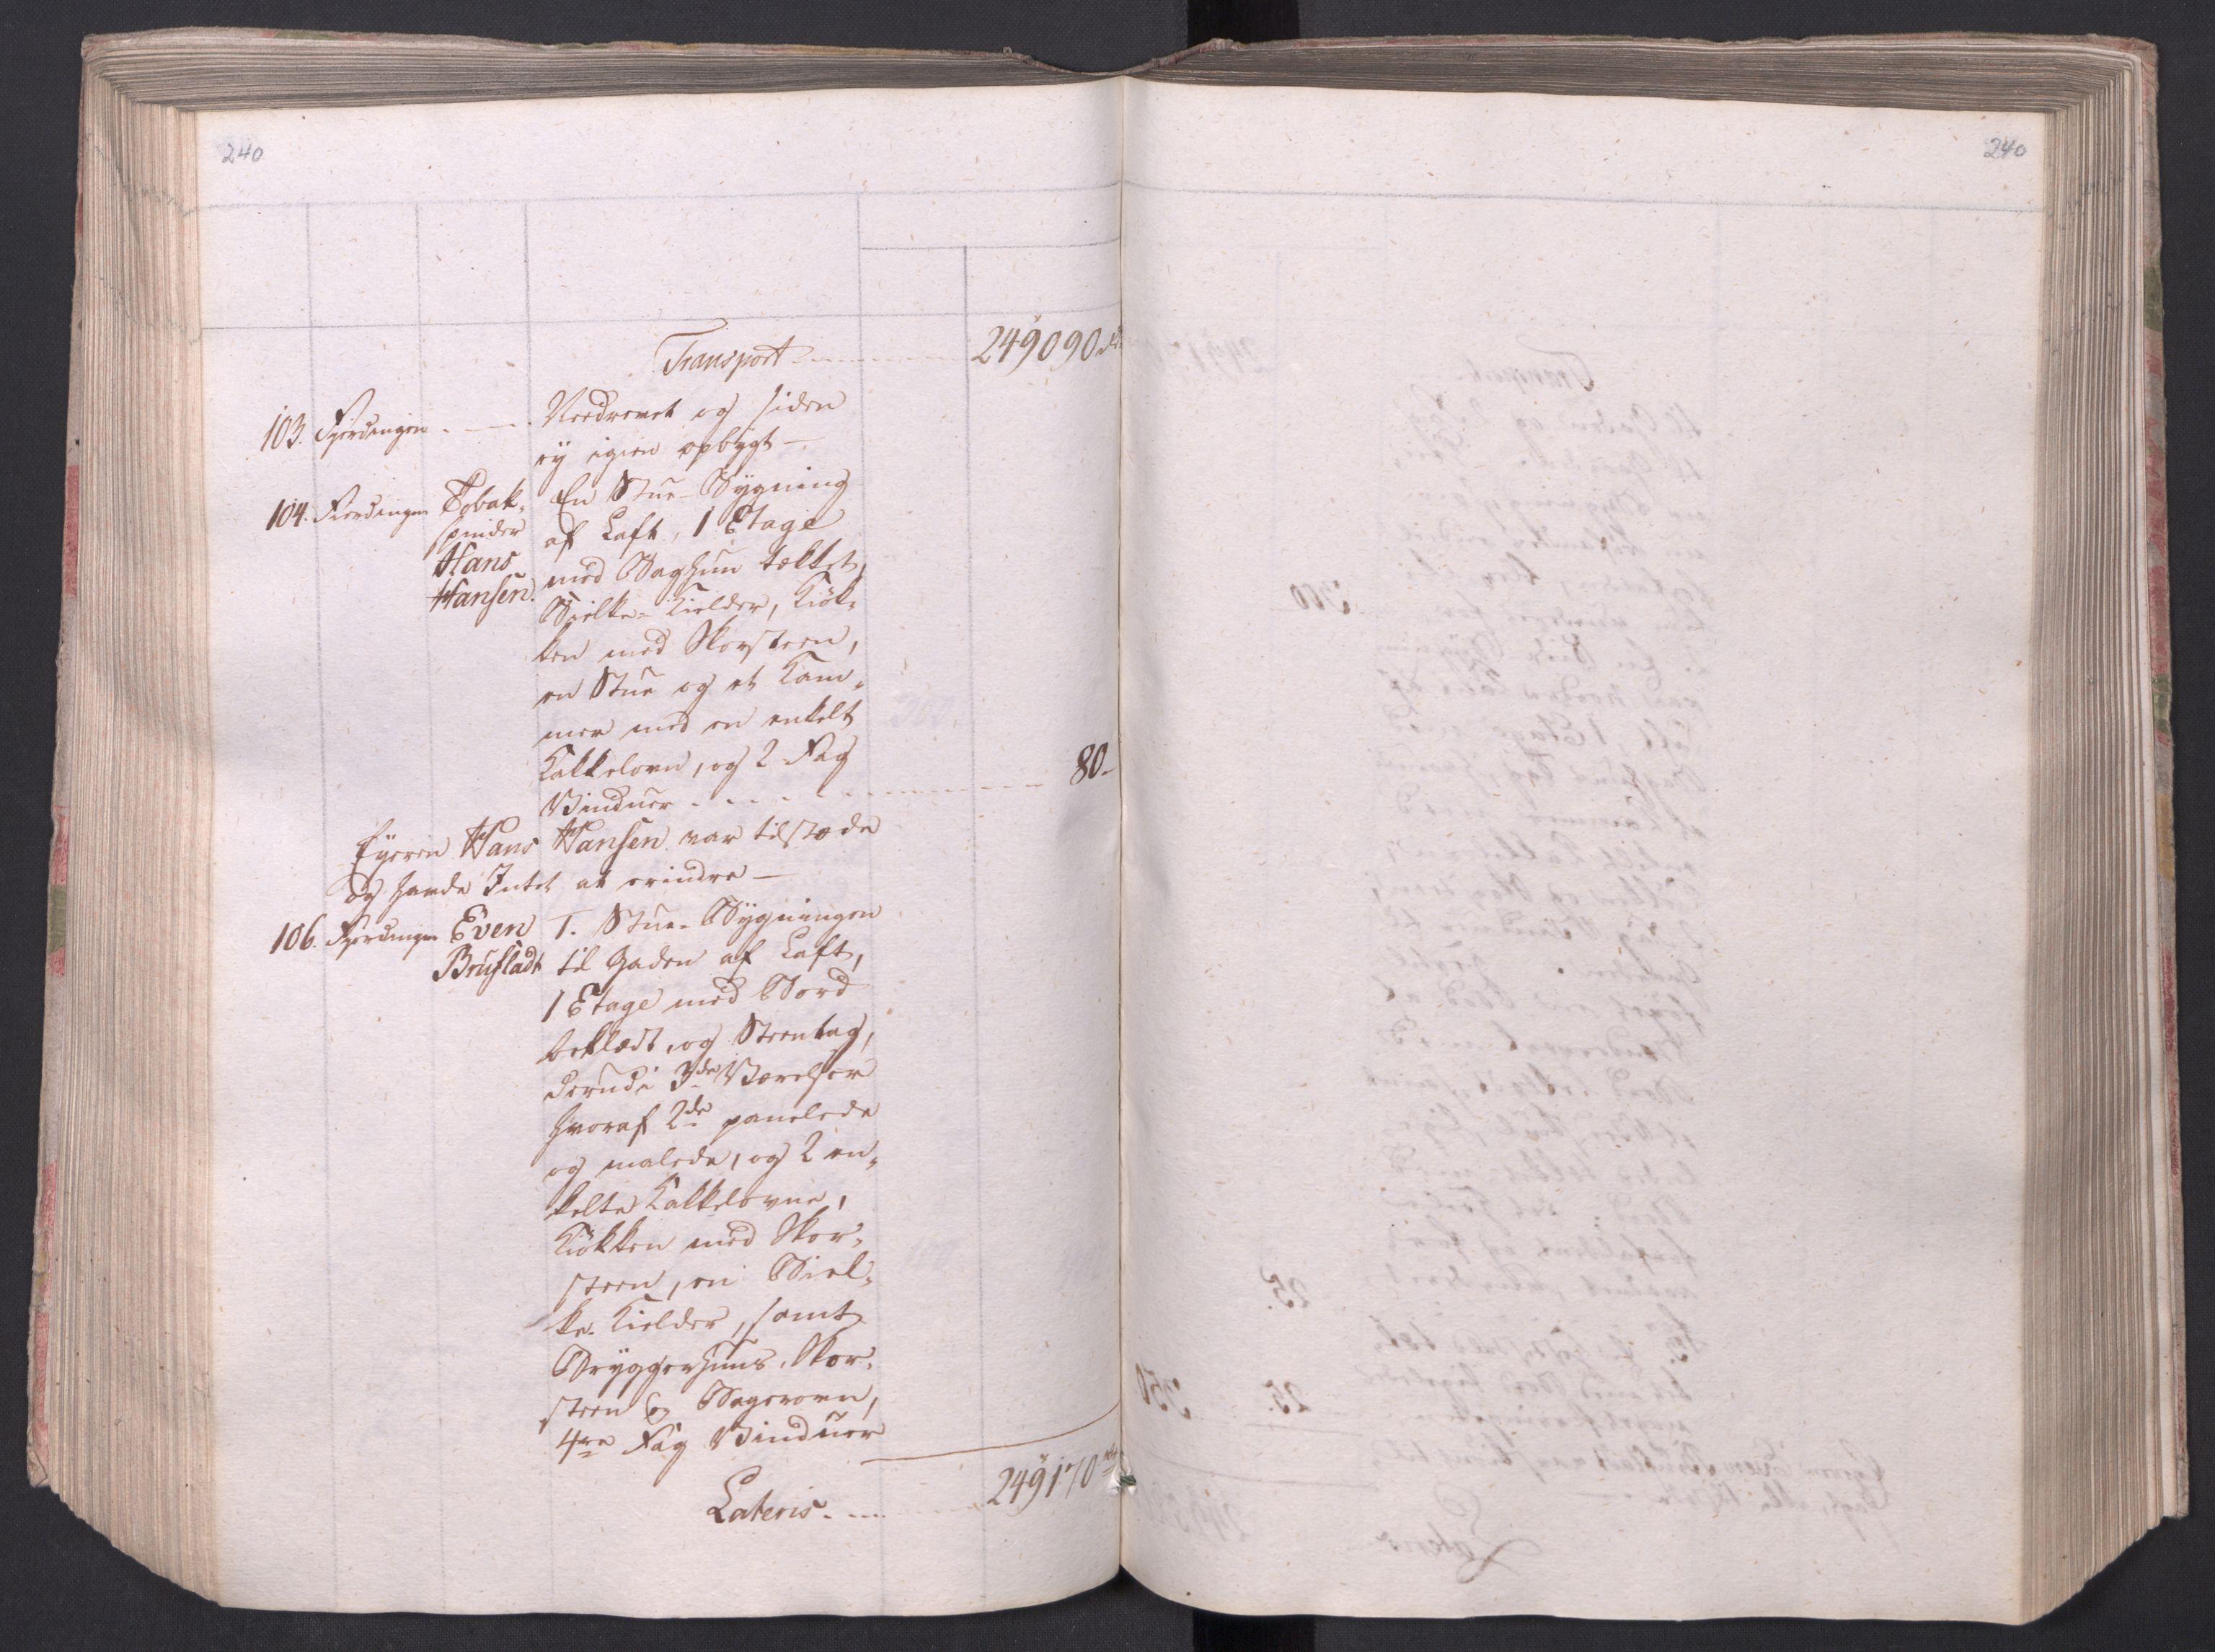 SAO, Kristiania stiftamt, I/Ia/L0015: Branntakster, 1797, s. 240